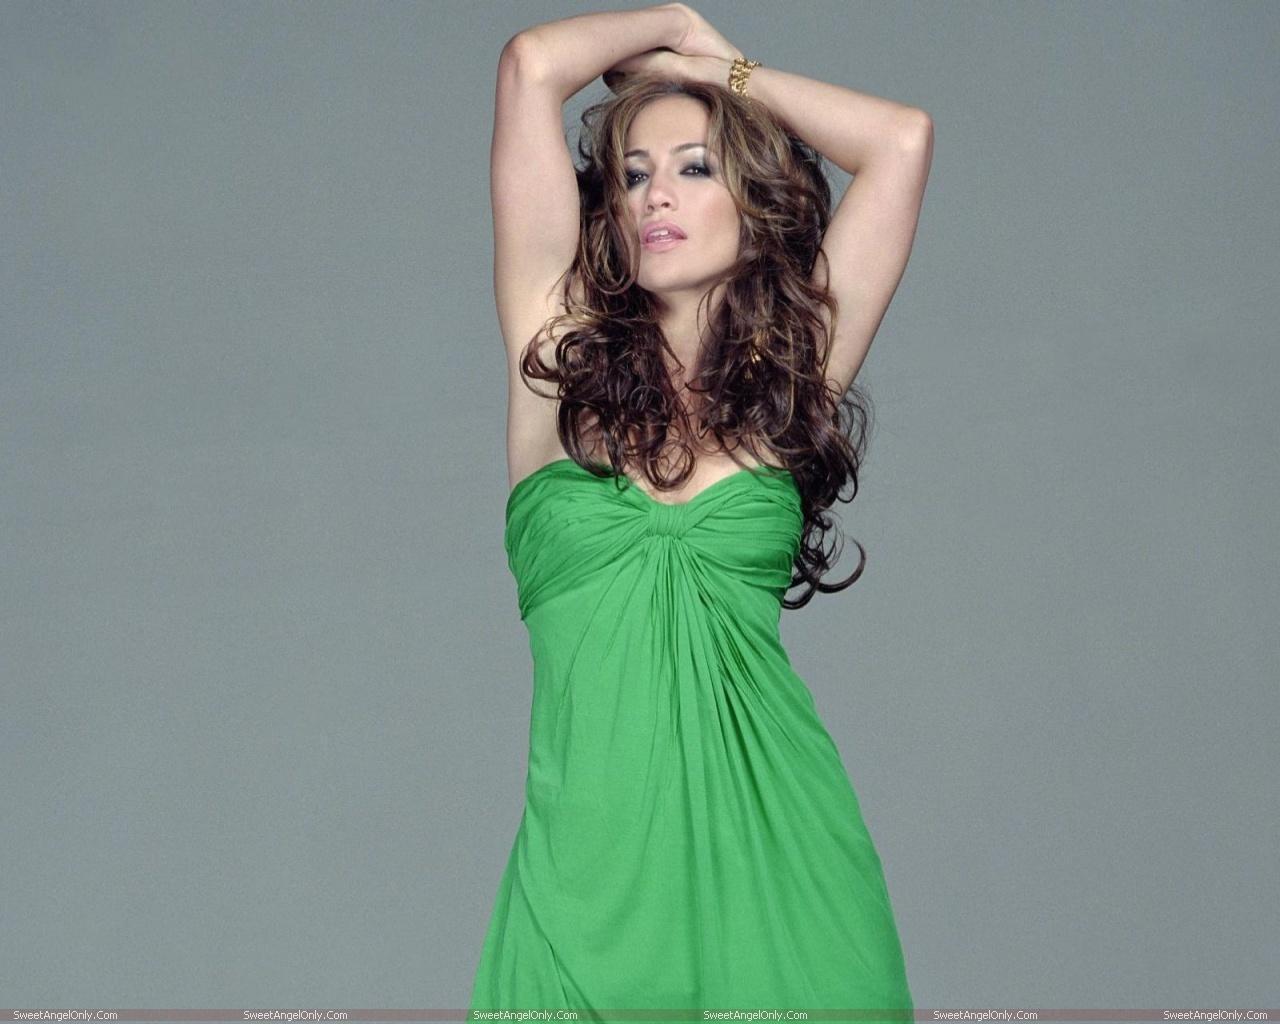 http://1.bp.blogspot.com/-VHafXNlow0w/TWjnCogI9mI/AAAAAAAAE1M/9SIi8tfc2Lk/s1600/actress_jennifer_lopez_hot_wallpapers_08.jpg